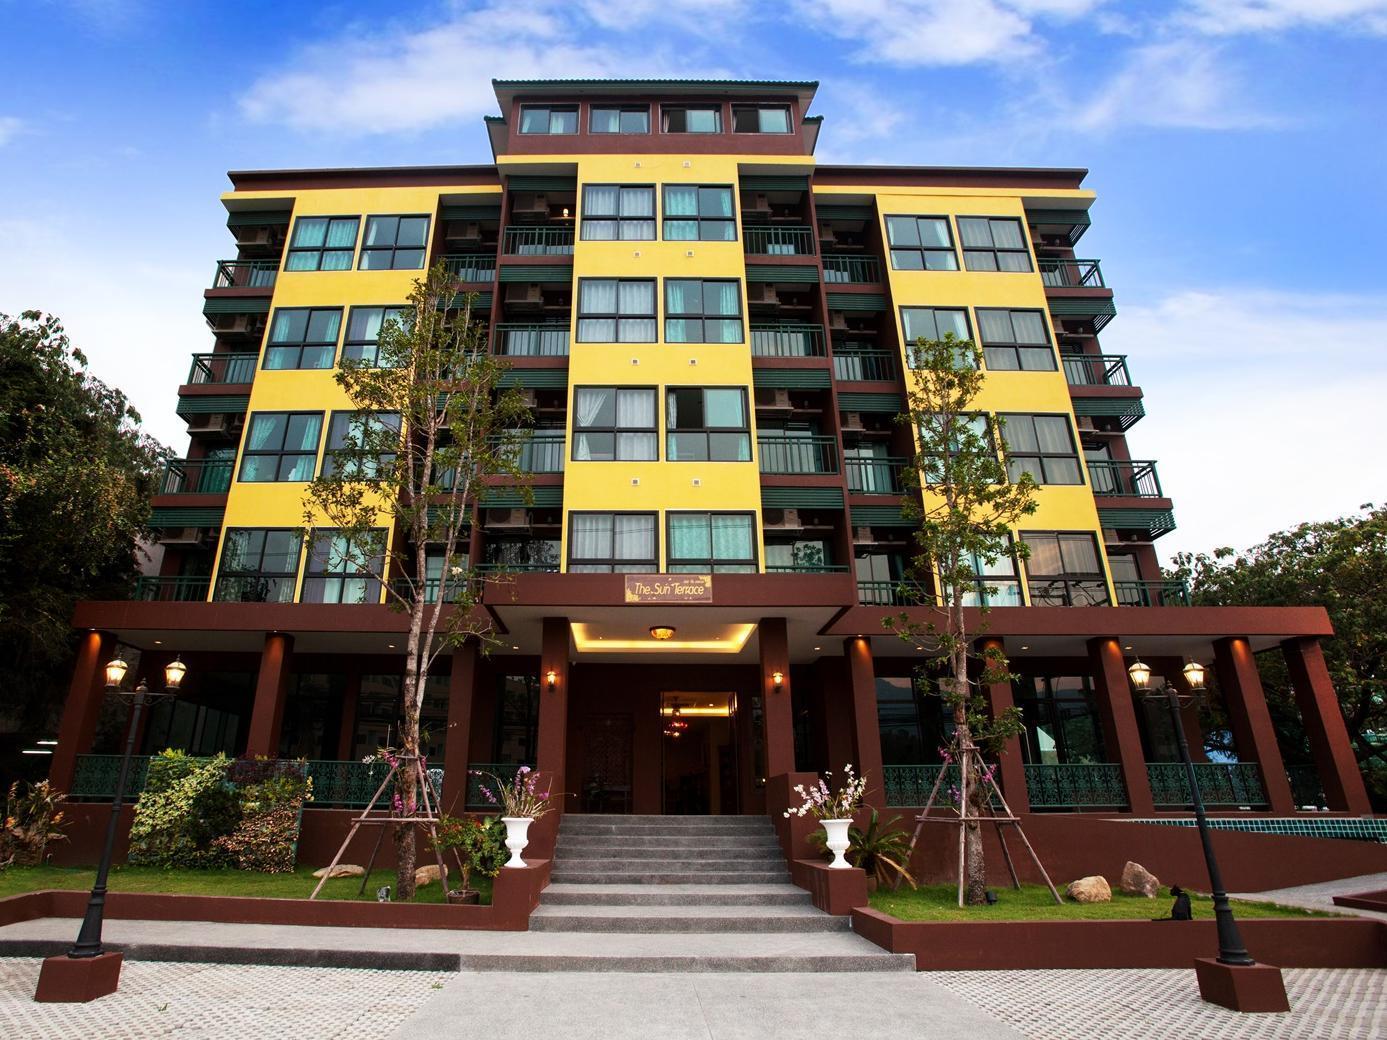 The Sun Terrace Hotel, Muang Chiang Mai